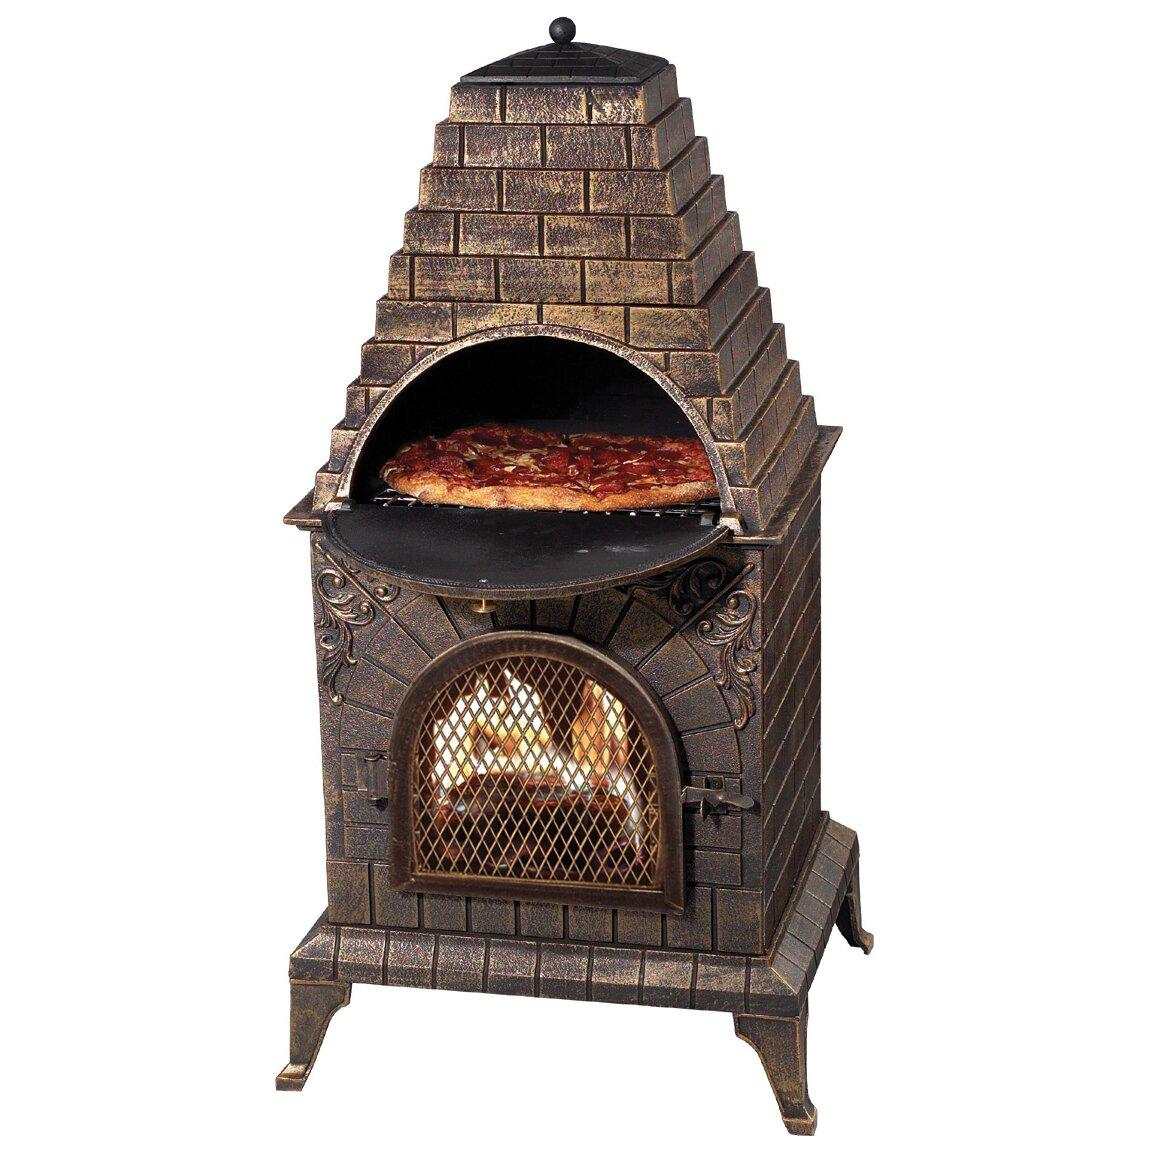 Deeco Aztec Allure Pizza Oven Outdoor Fireplace & Reviews